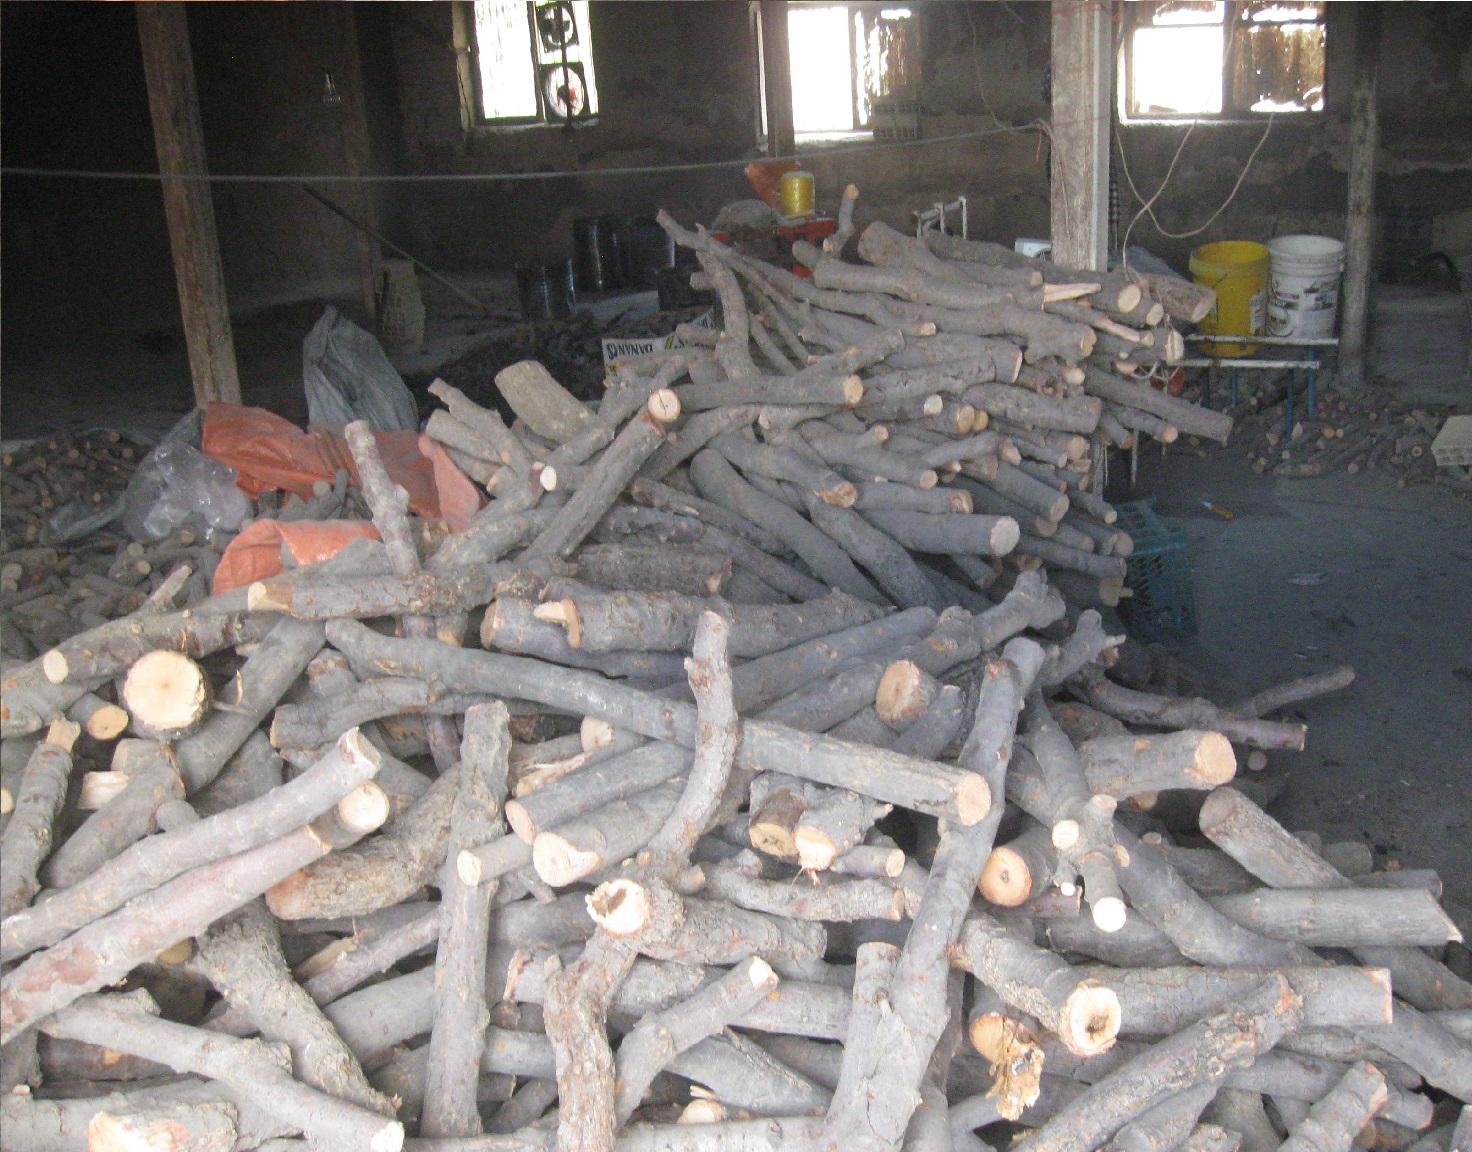 کشف و ضبط چهار تن چوب آلات قاچاق